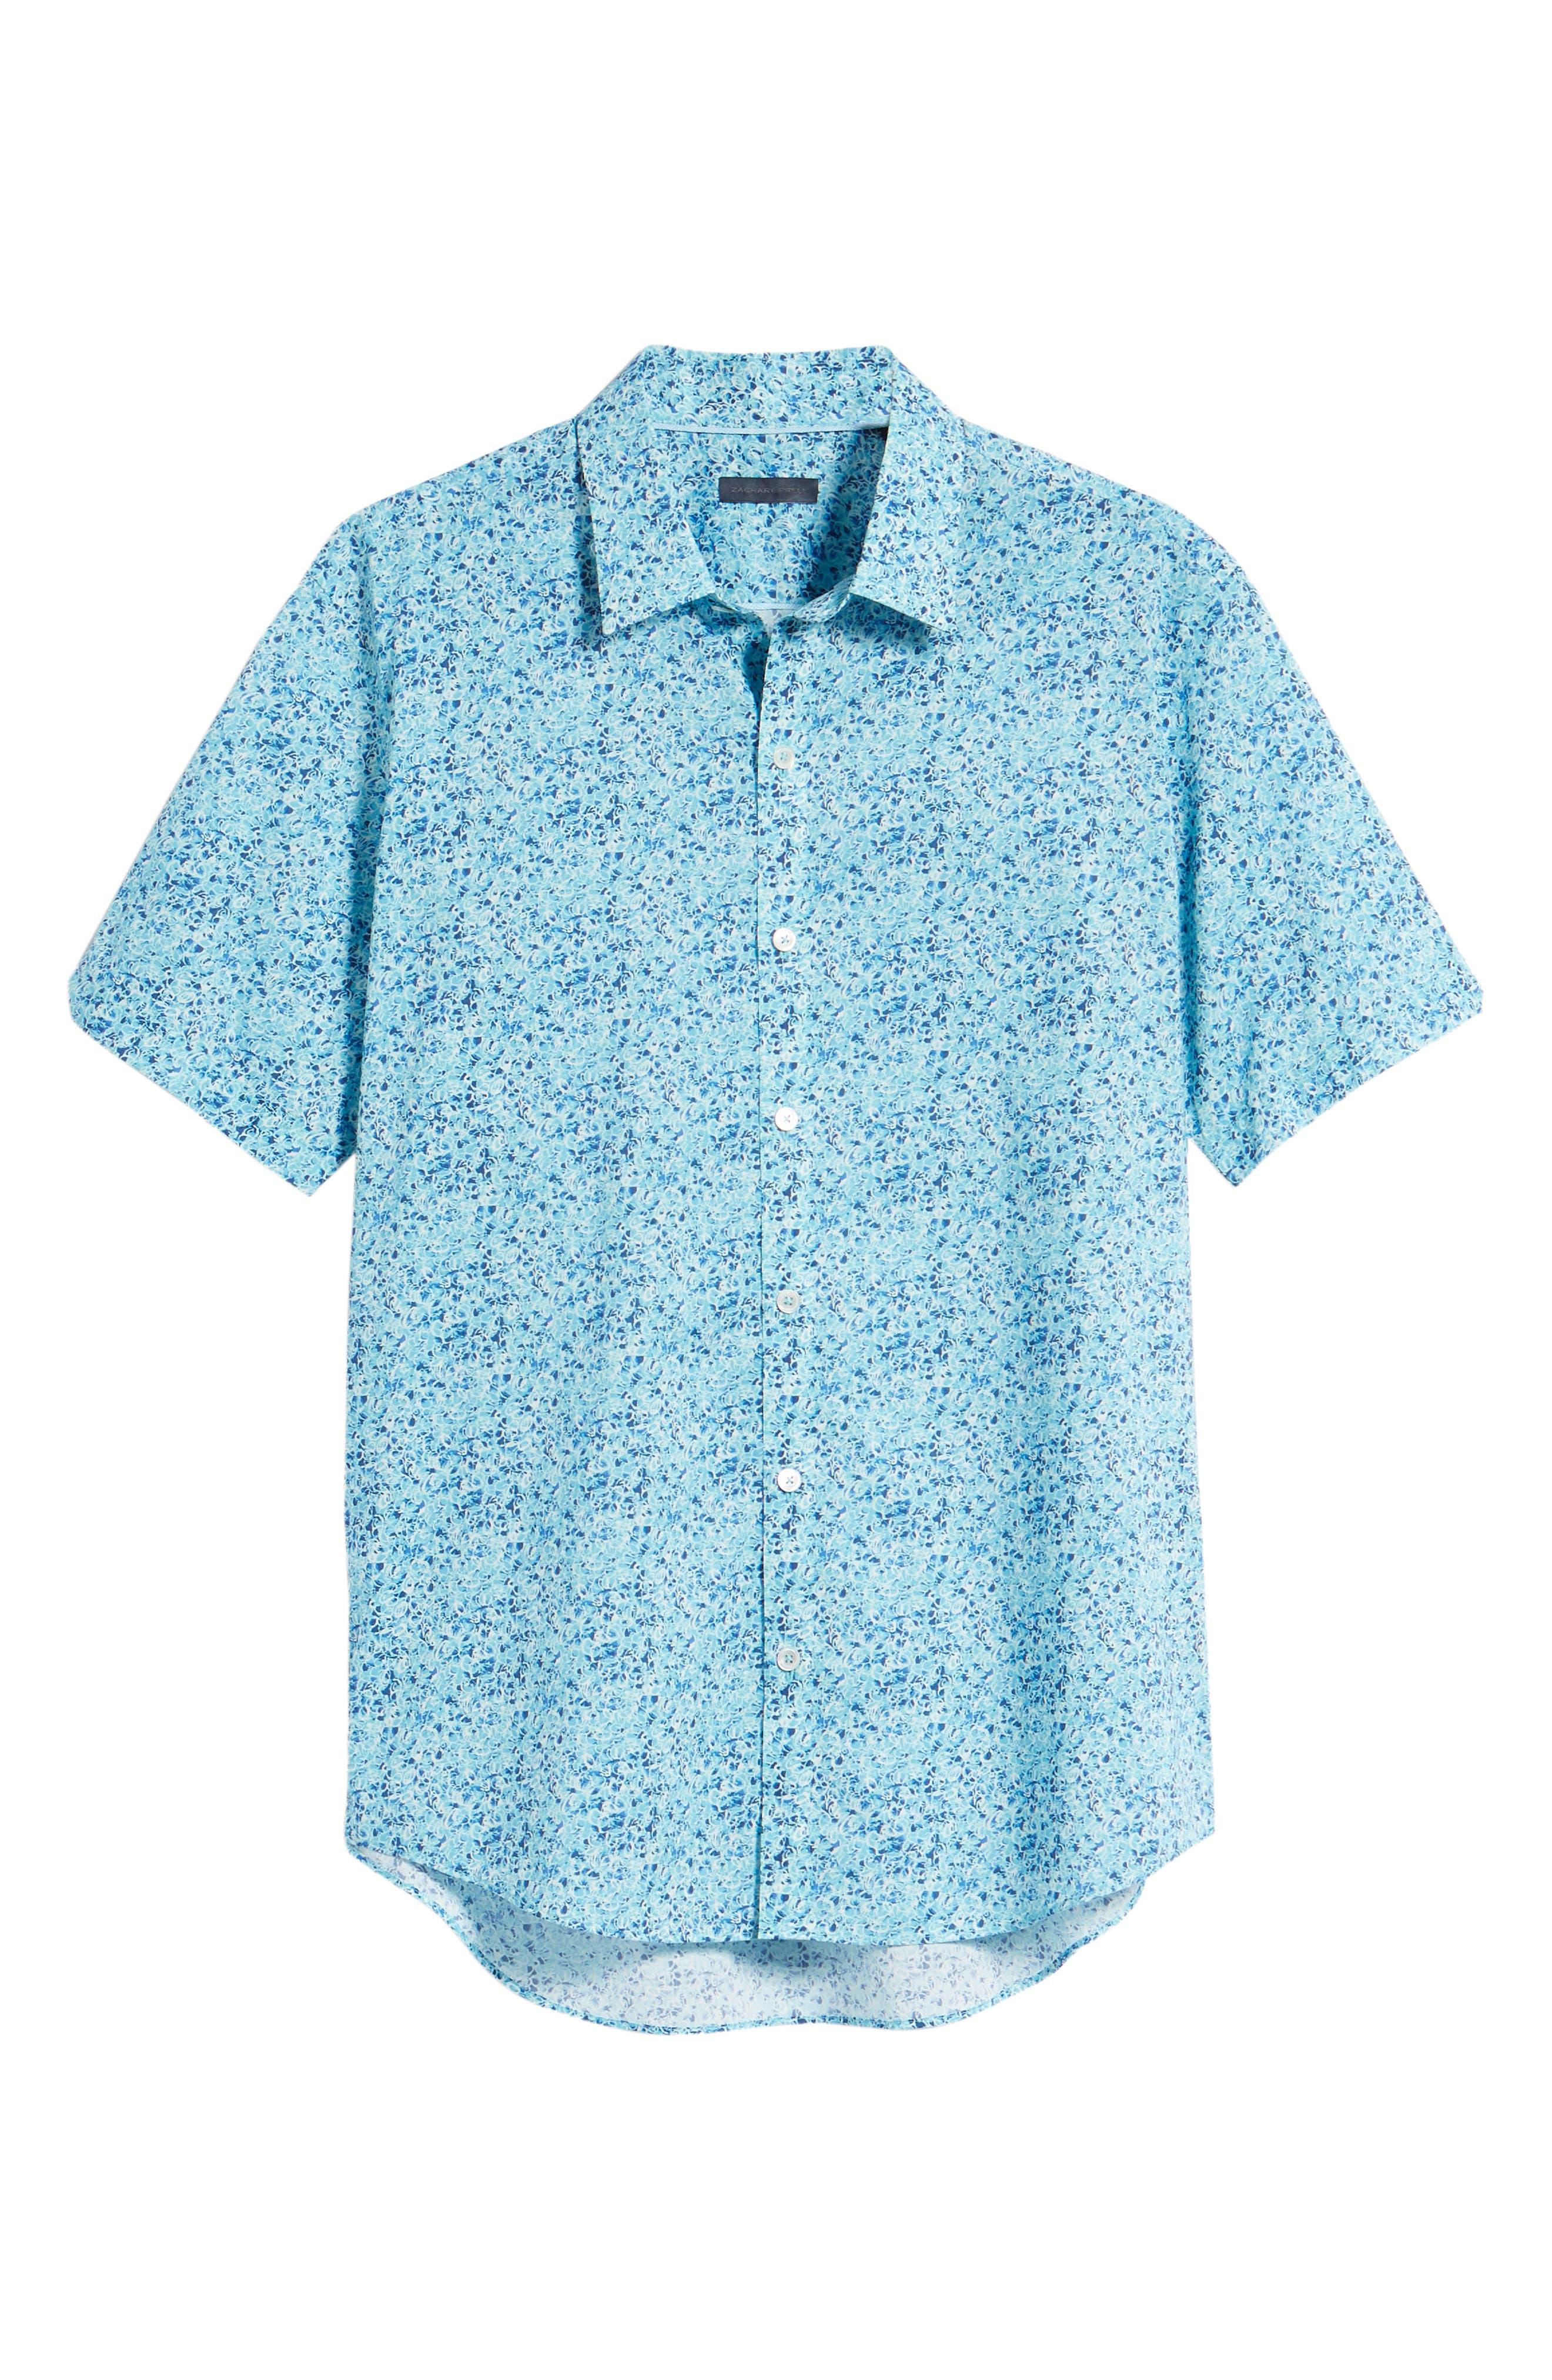 Kincaid Scribble Print Sport Shirt,                             Alternate thumbnail 6, color,                             Aqua